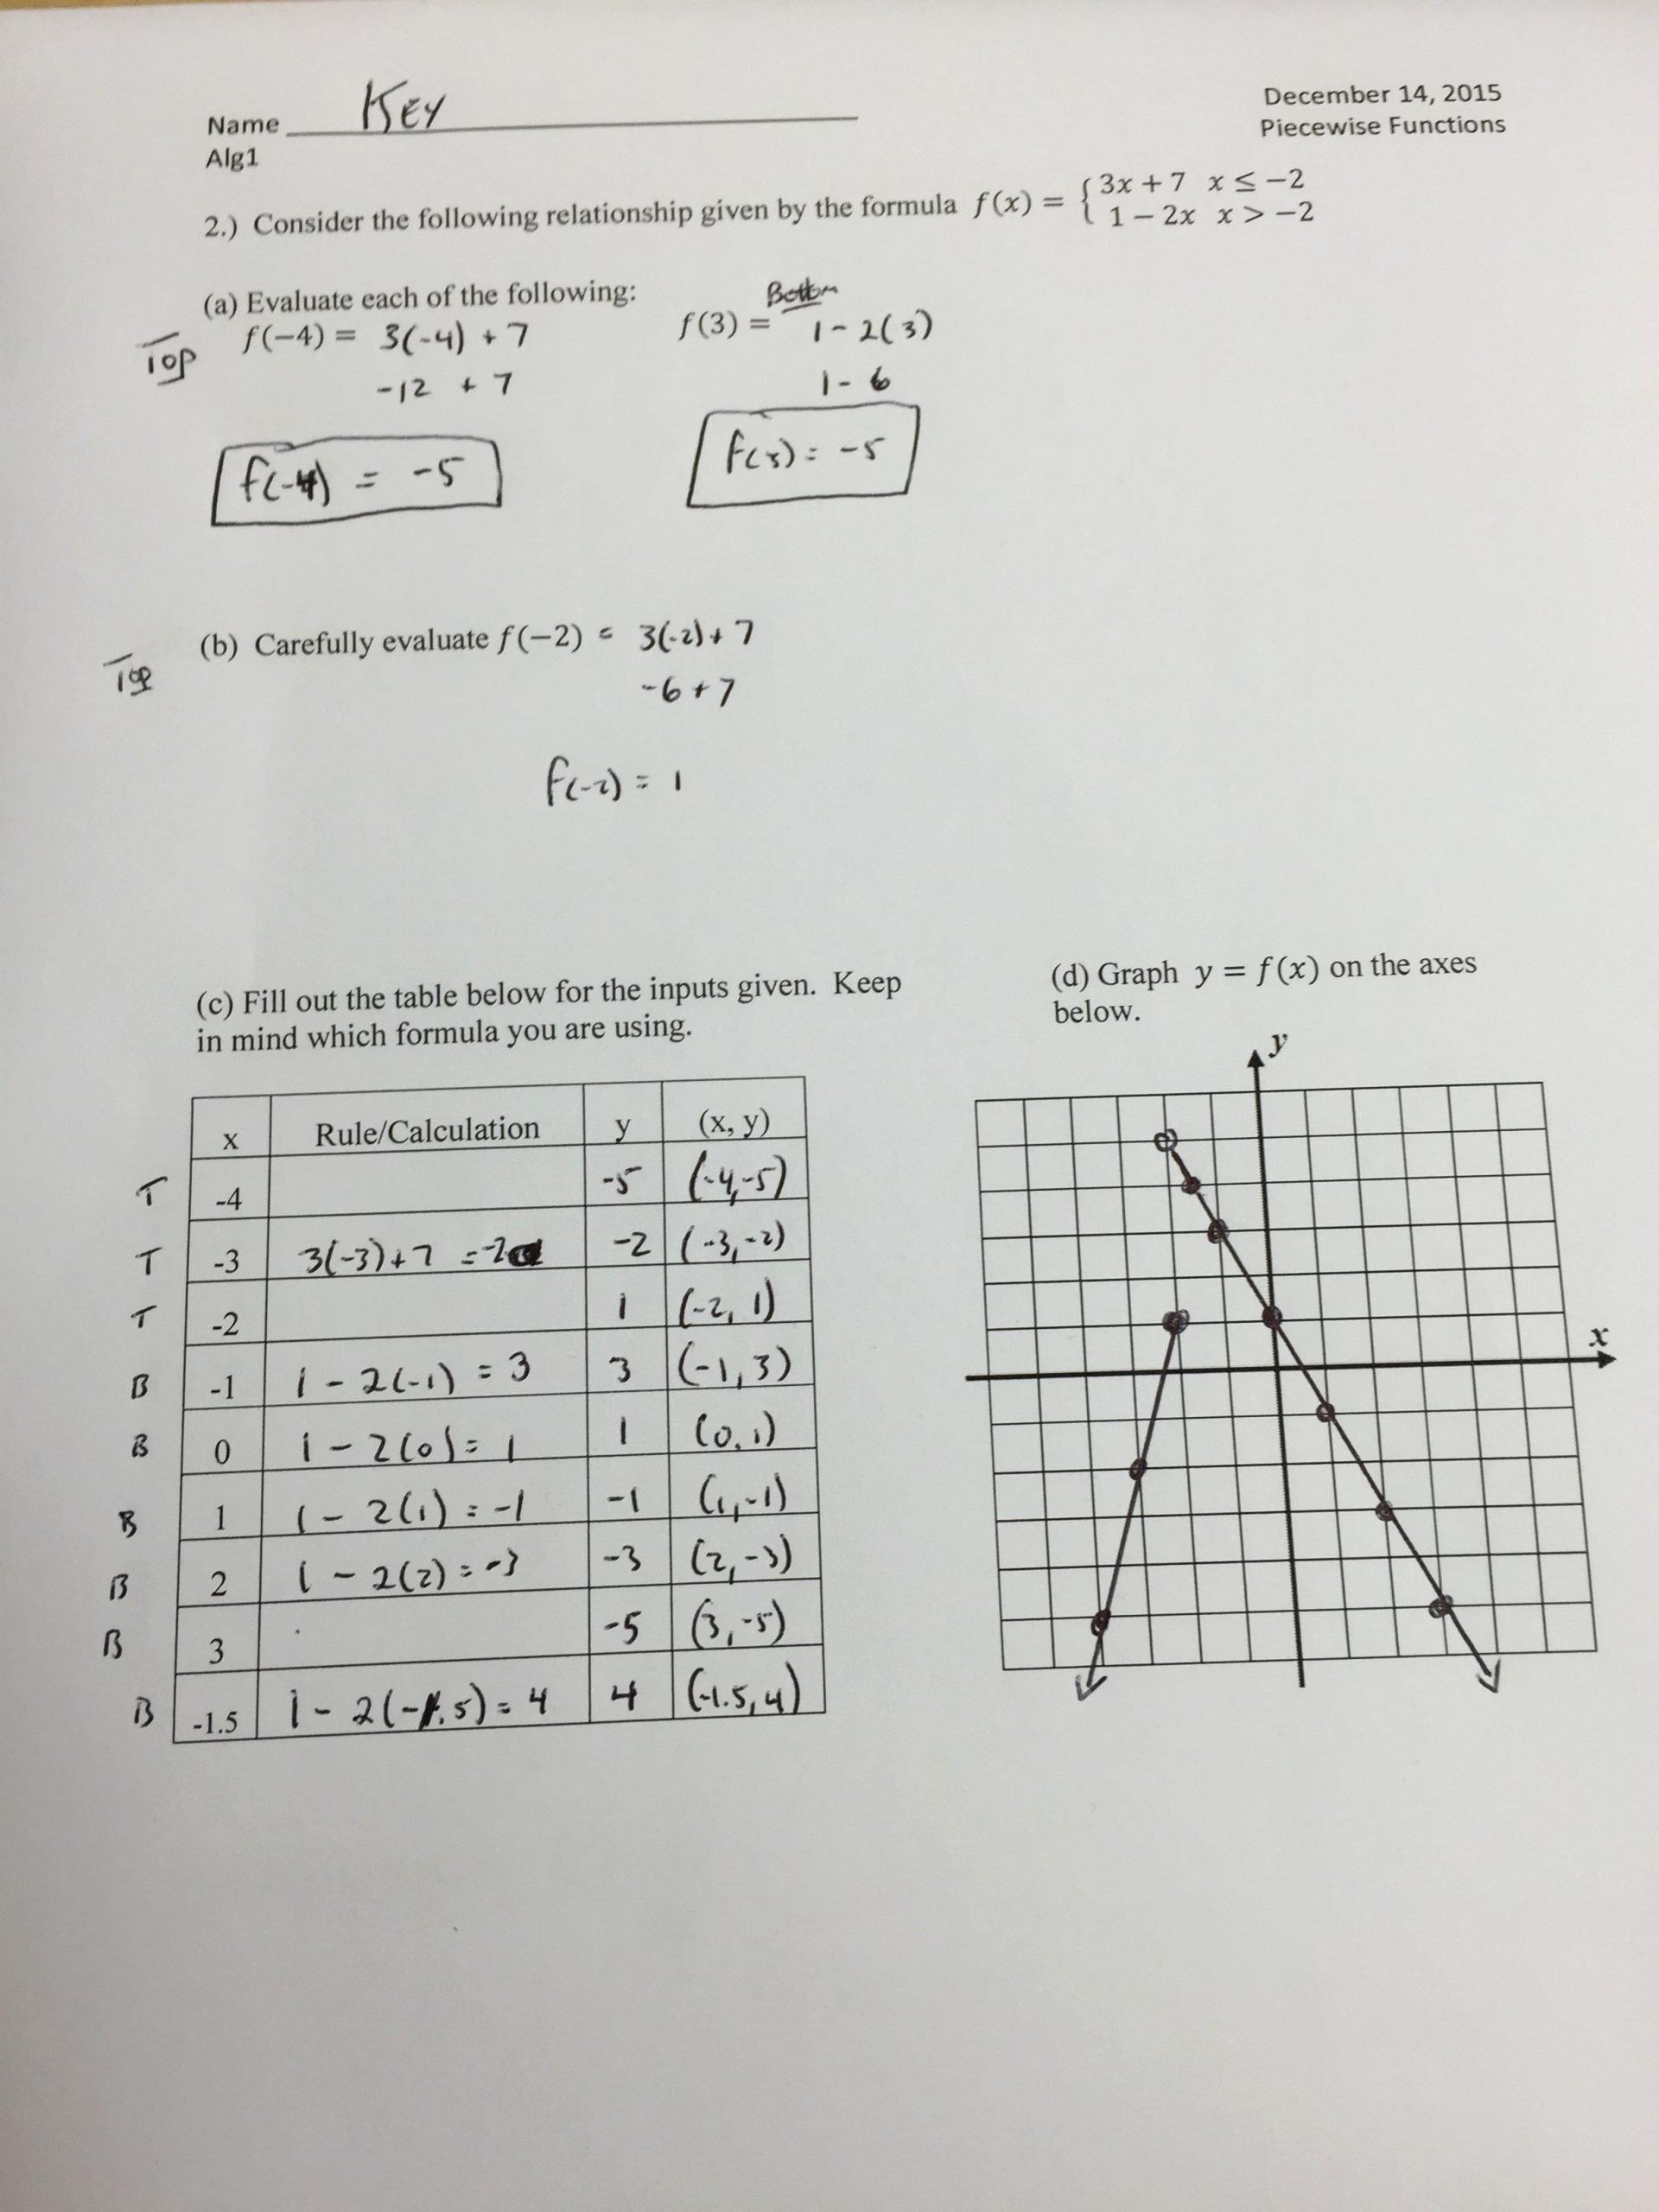 Piecewise Functions Word Problems Worksheet Printable 31 Worksheet Piecewise Functions Answer Key Worksheet